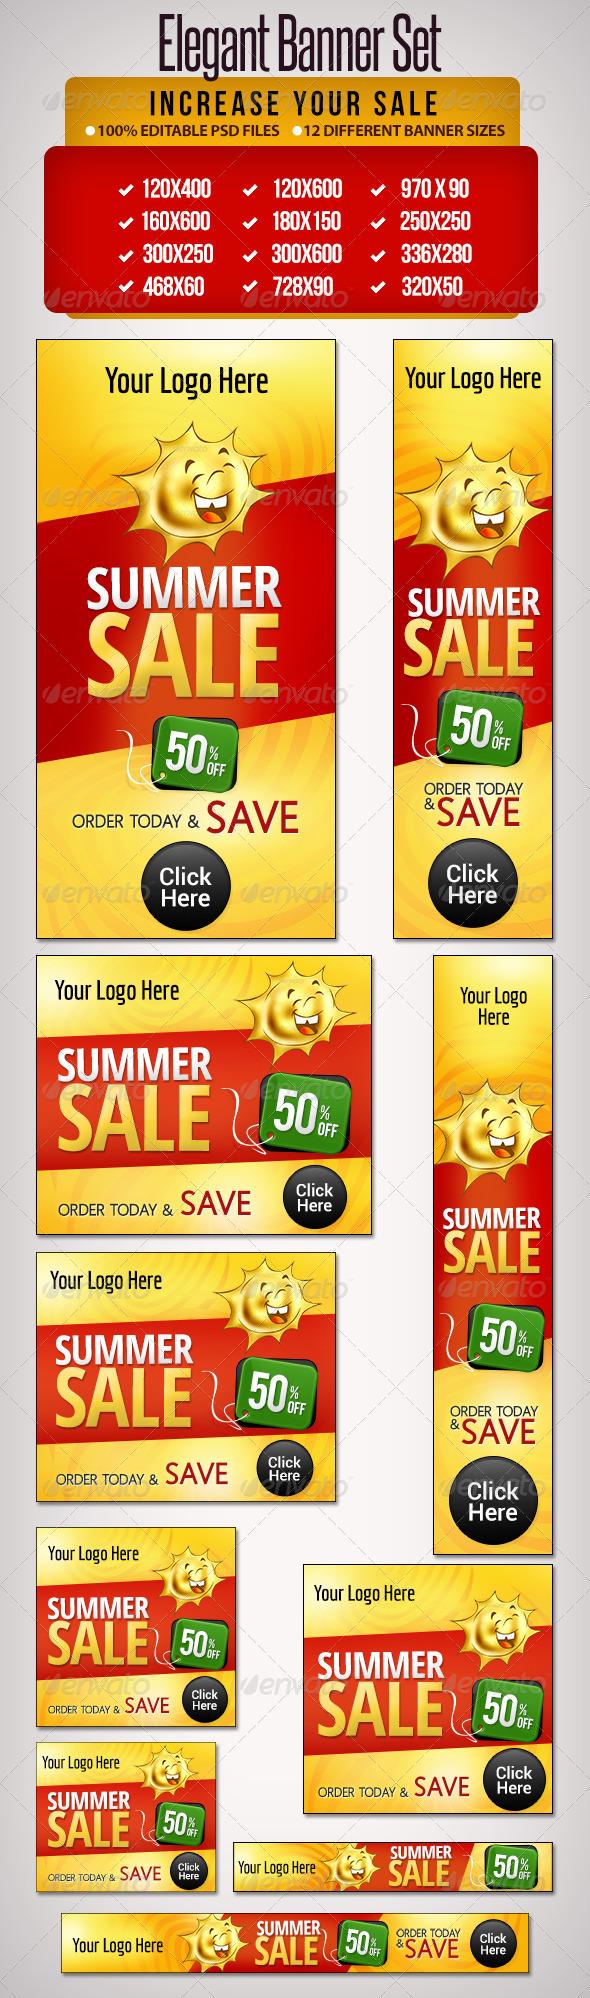 GraphicRiver Summer Banner Set All Standard banner sizes 5133816